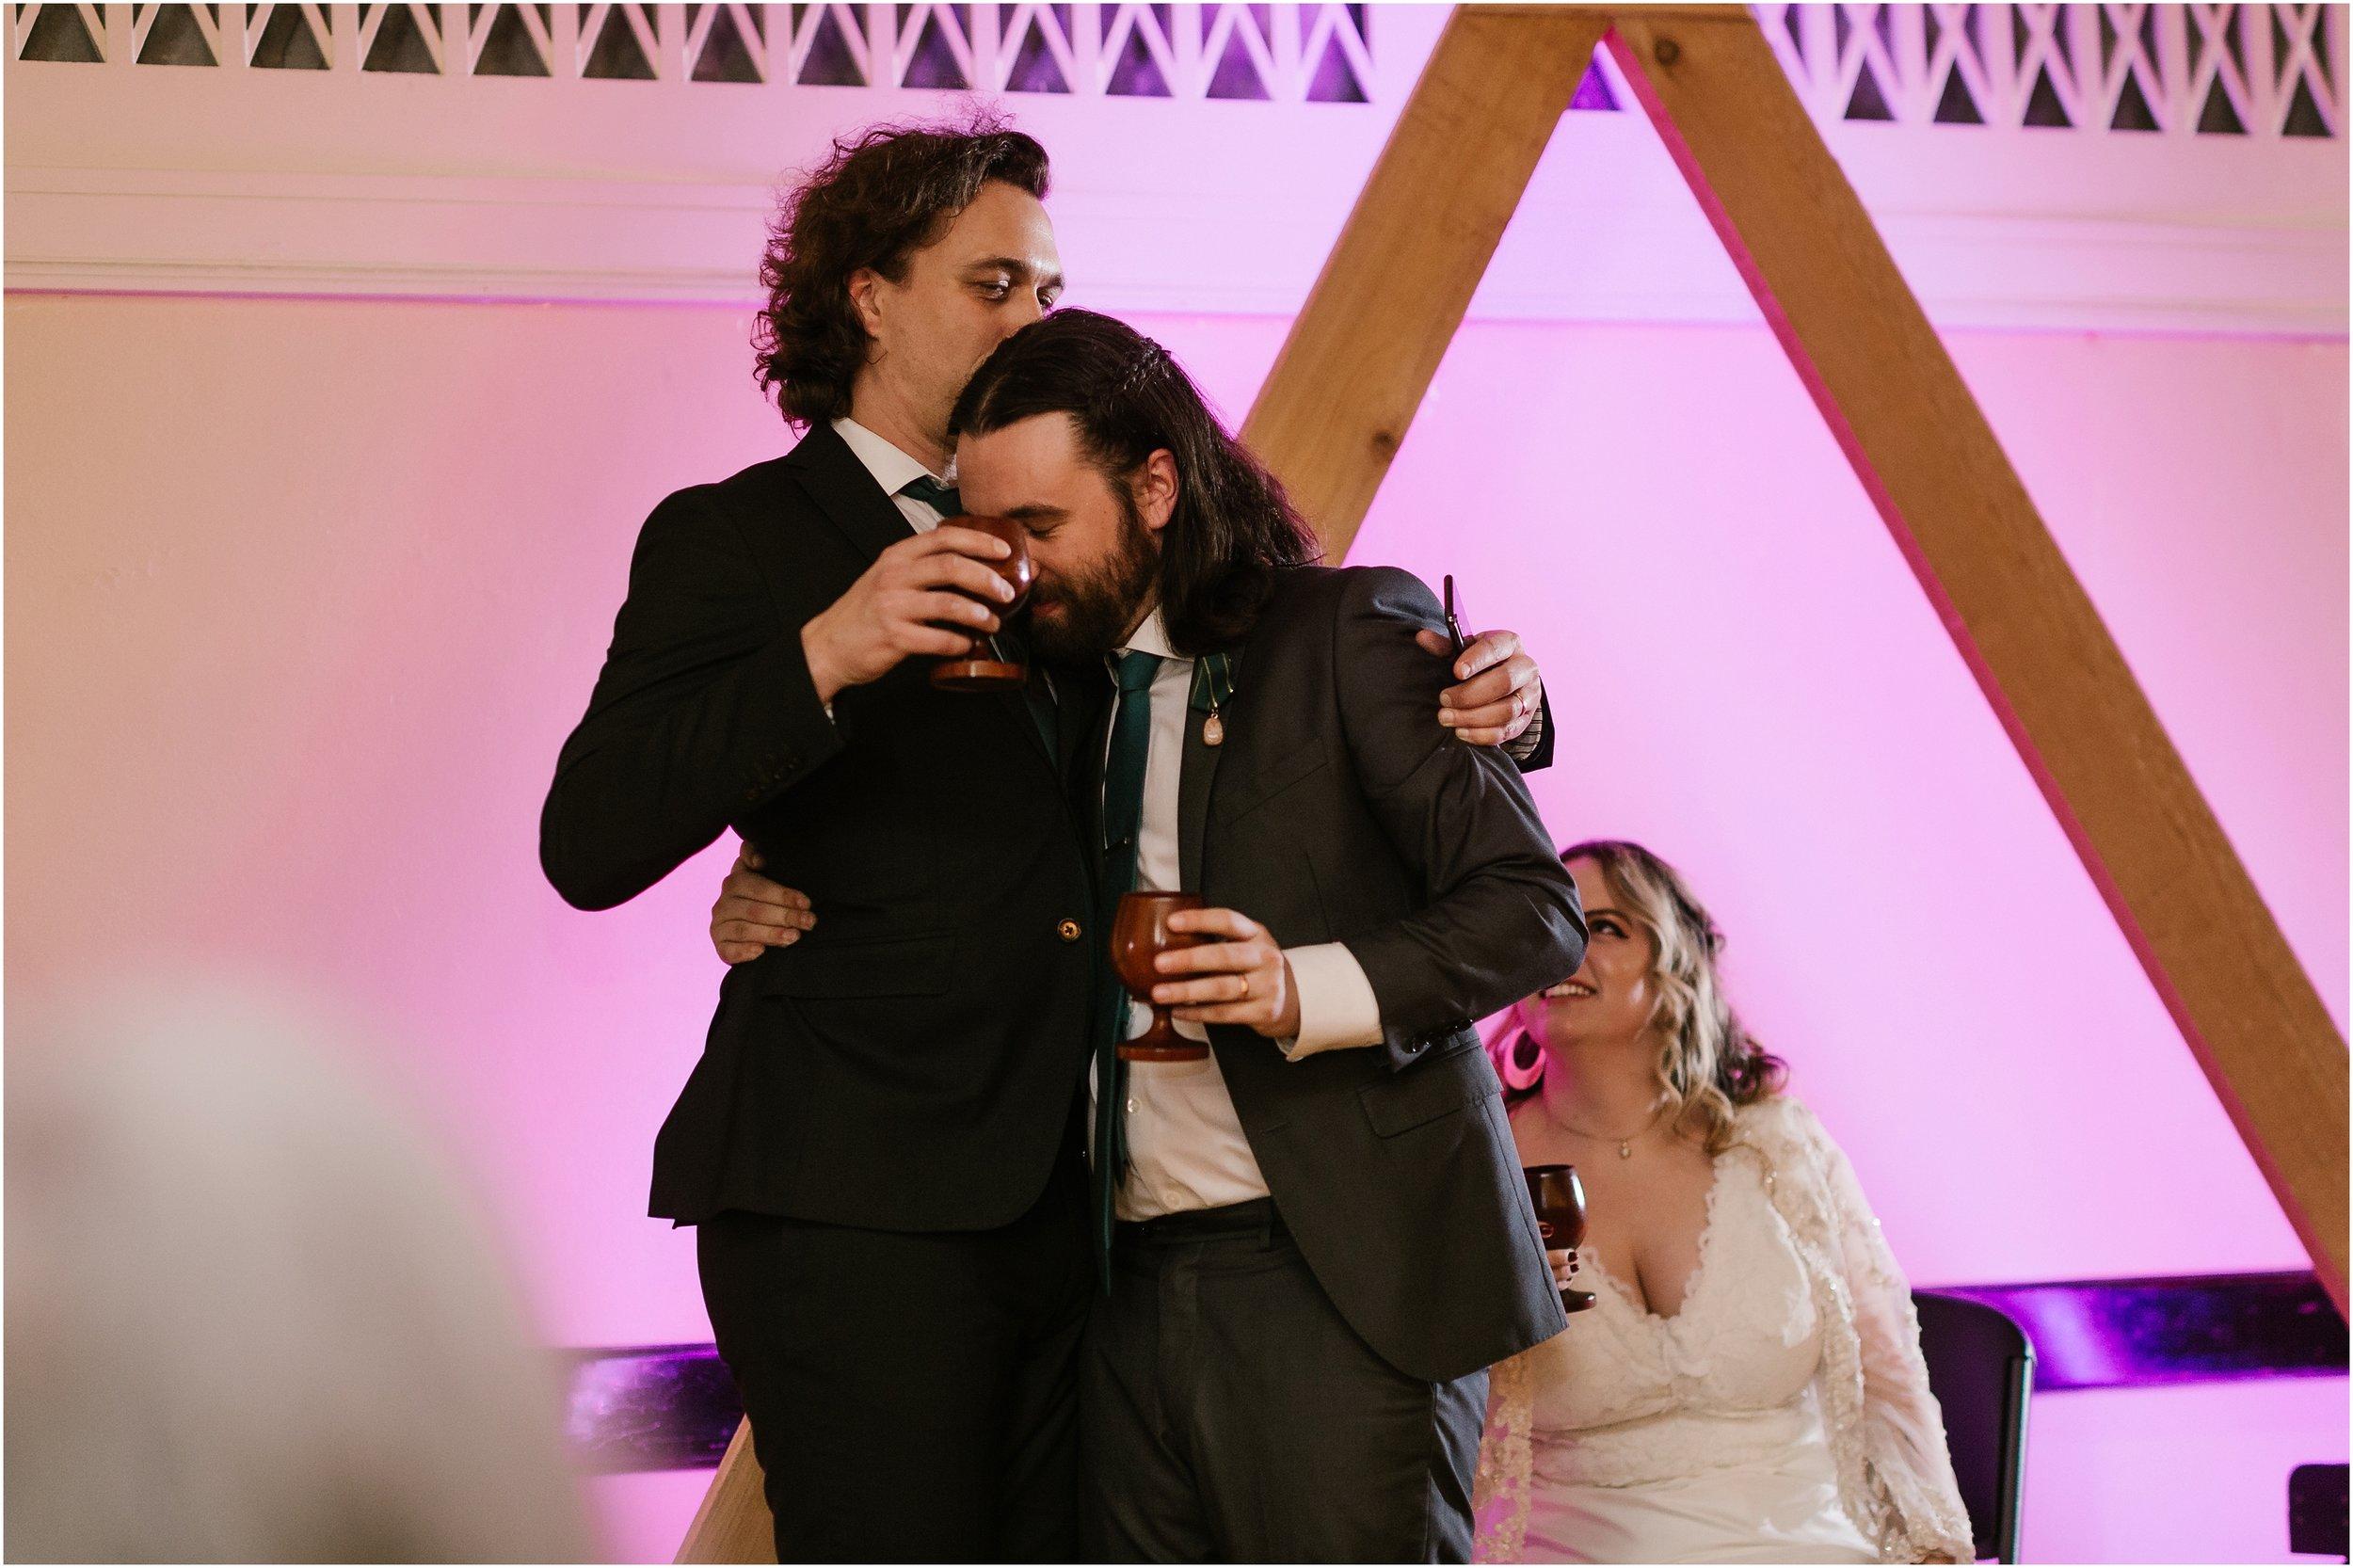 Rebecca_Shehorn_Photography_Indianapolis_Wedding_Photographer_9475.jpg